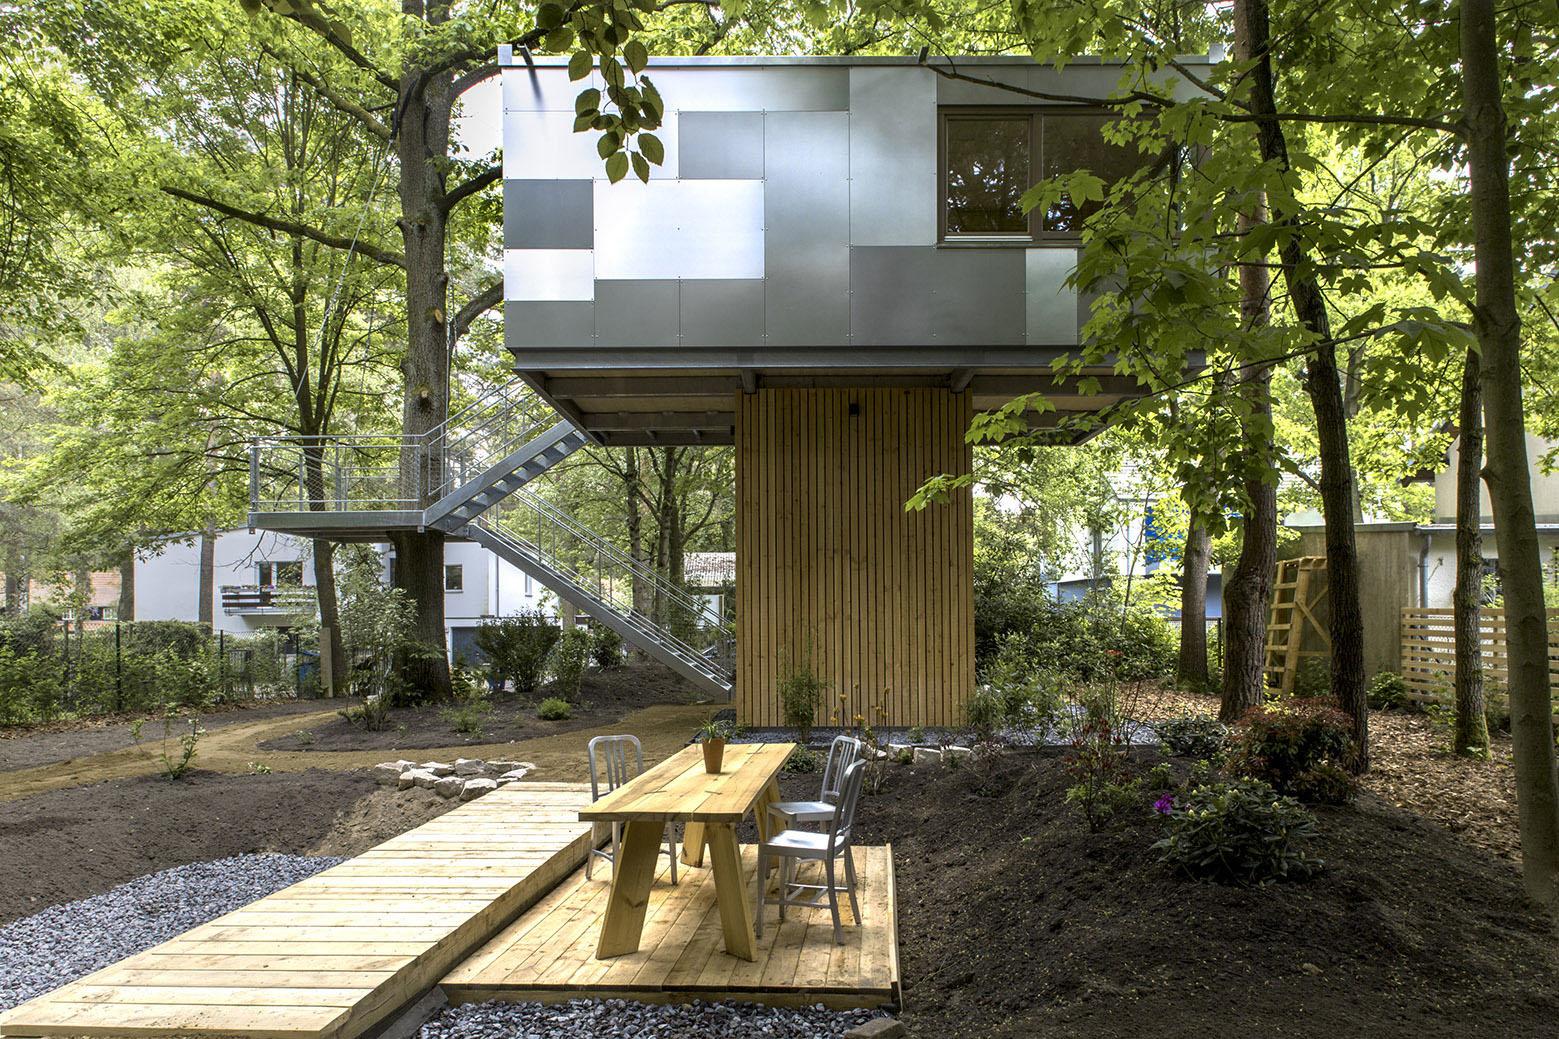 tiny treehouse urban oasis in berlin idesignarch interior design architecture interior. Black Bedroom Furniture Sets. Home Design Ideas